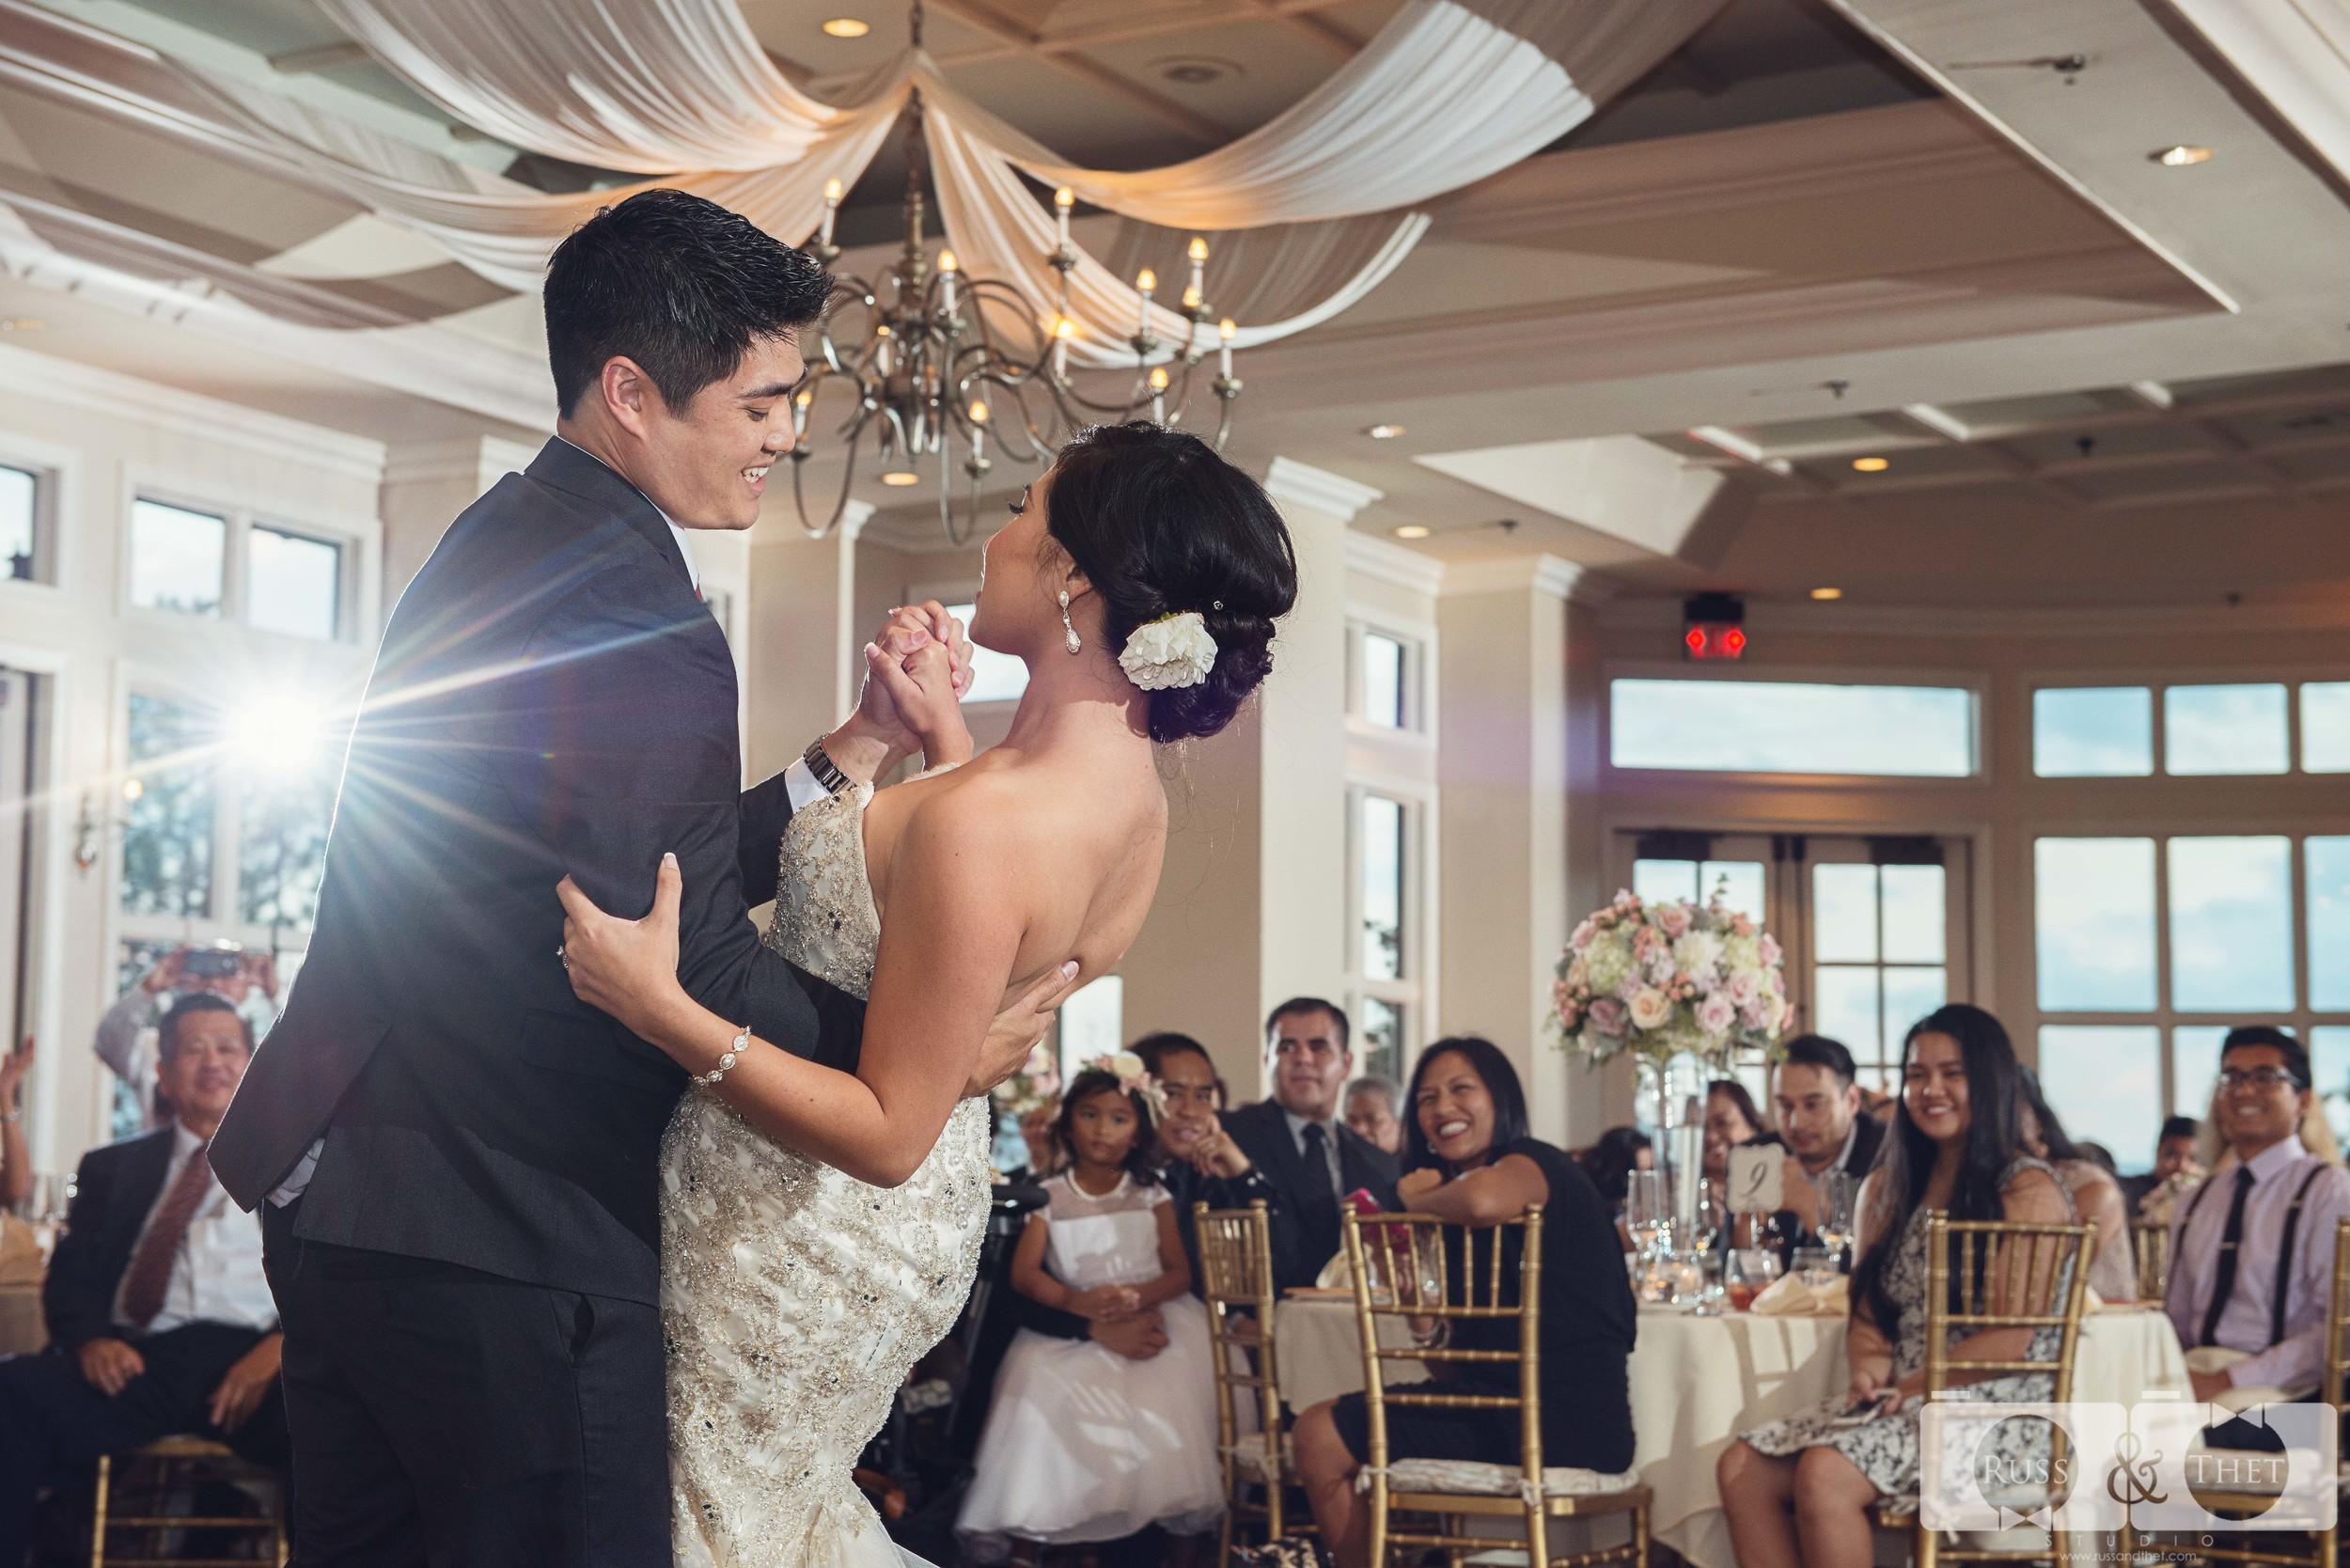 summit-house-fullerton-wedding-photographer-115.JPG